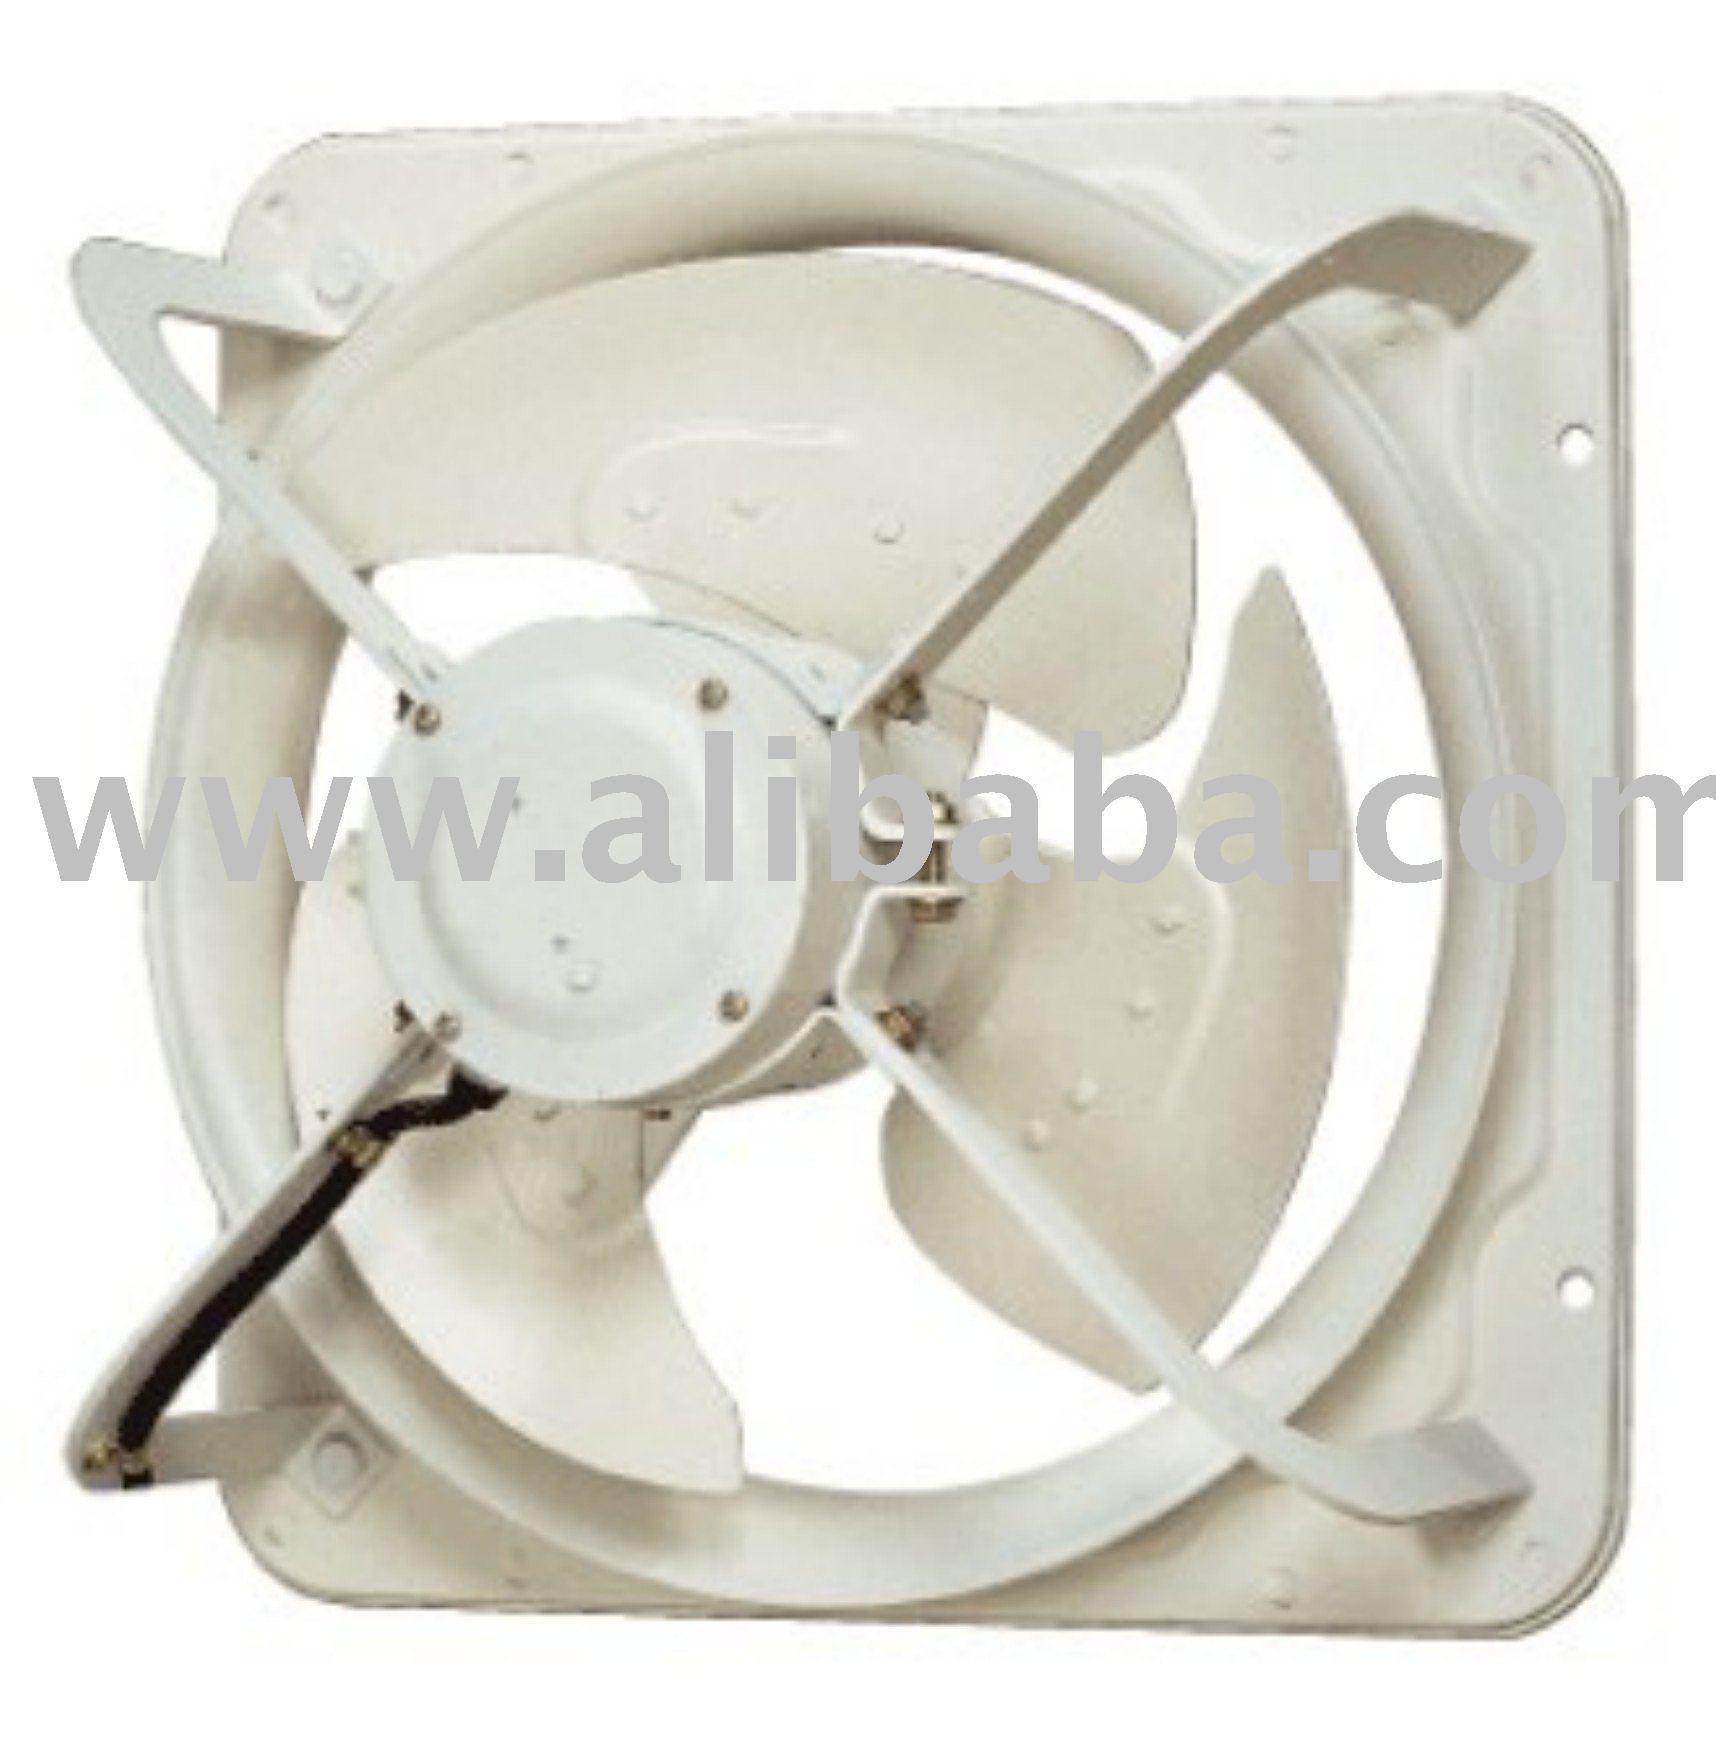 High Pressure Industrial Ventilating Fans #5D4F3B